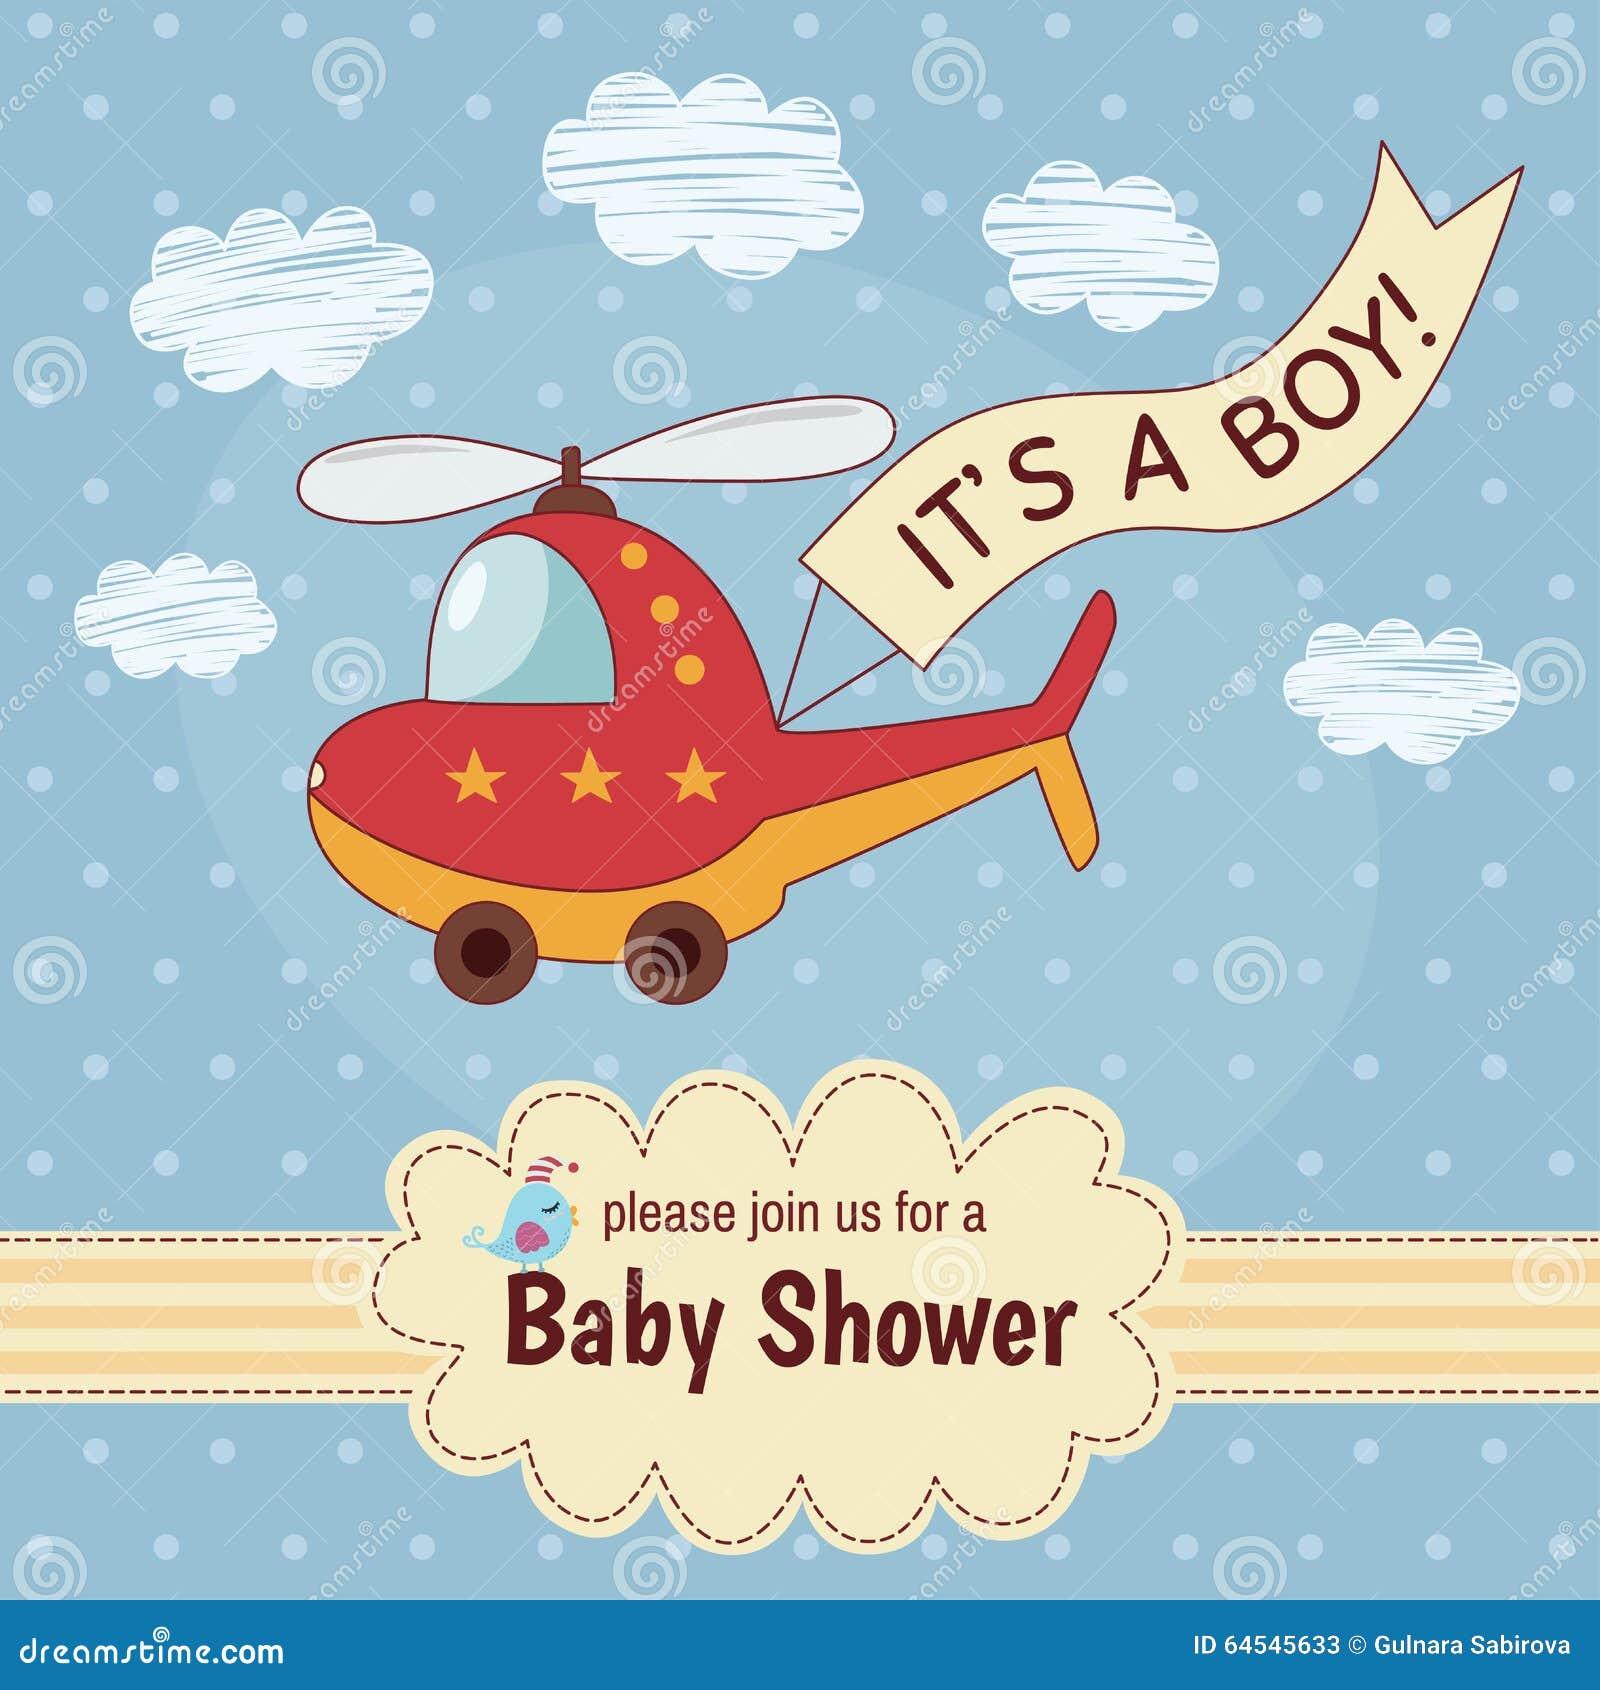 baby shower invitation card it u0026 39 s a boy with a cute